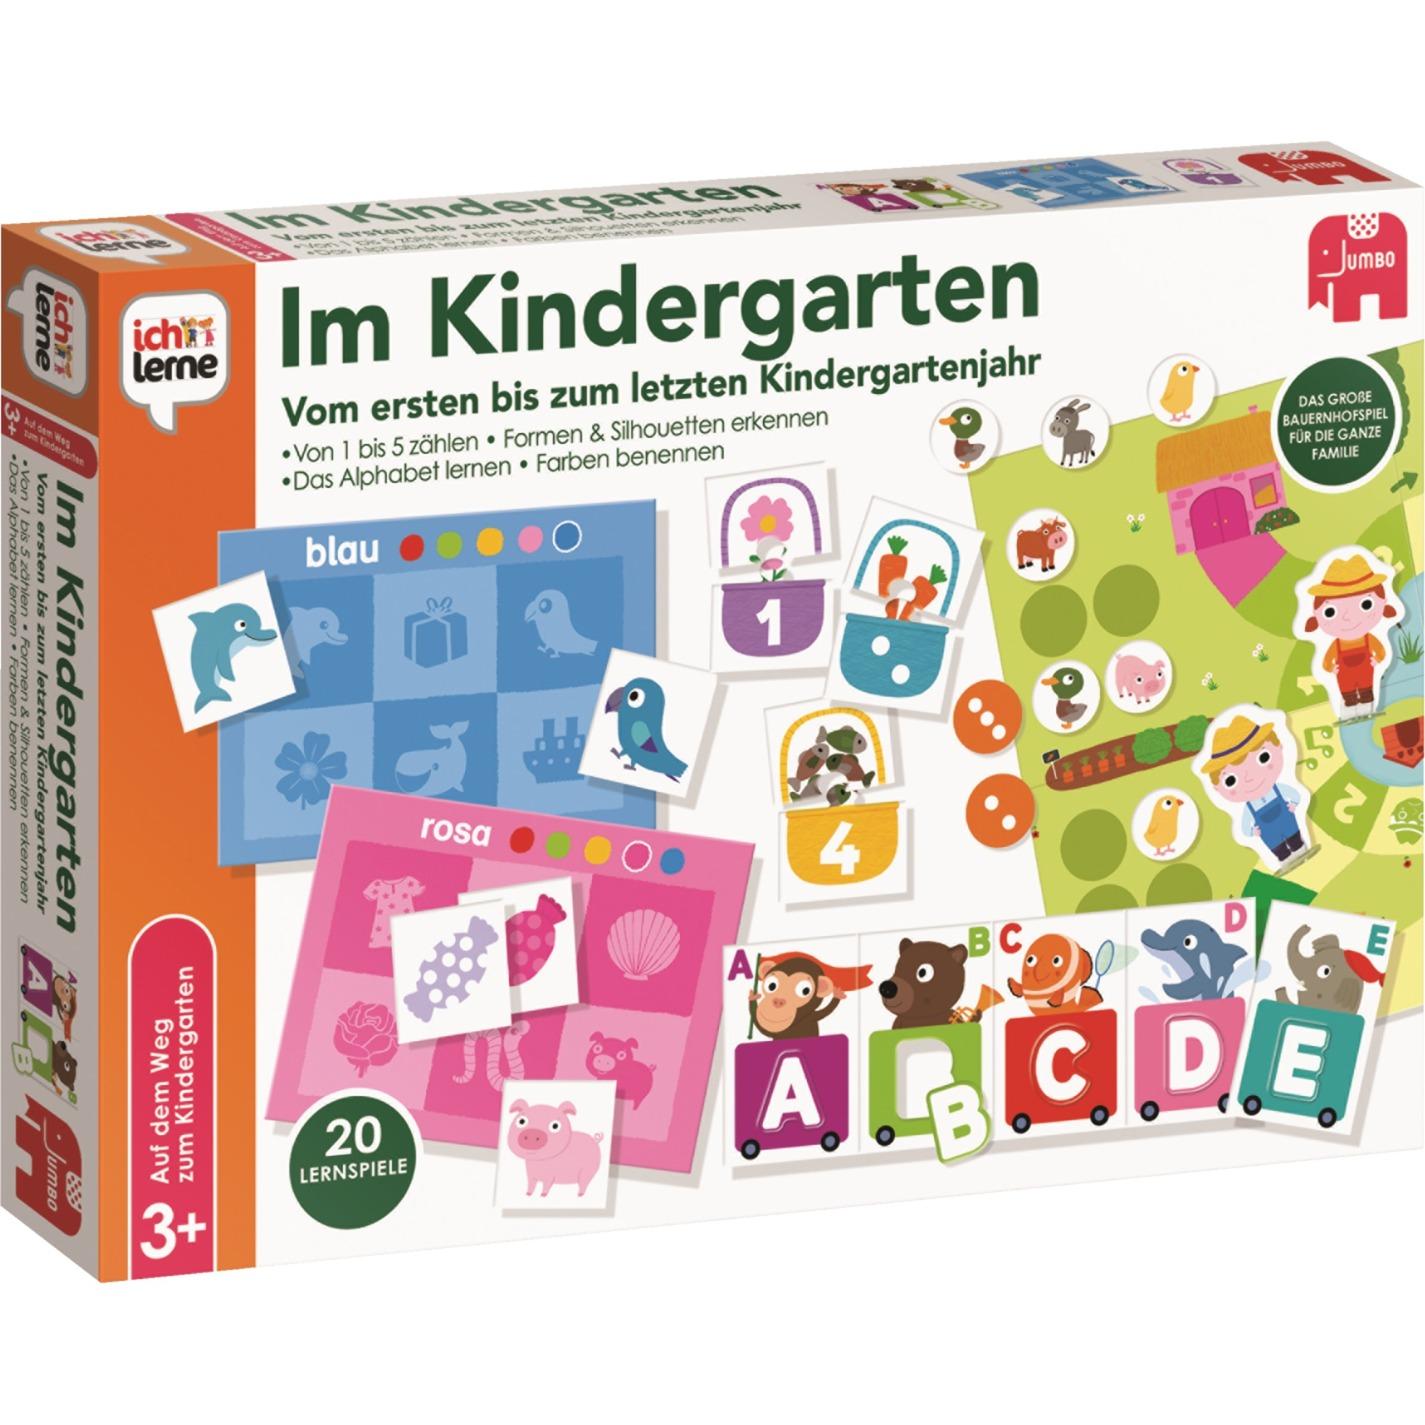 Im Kindergarten, Jeu d'apprentissage